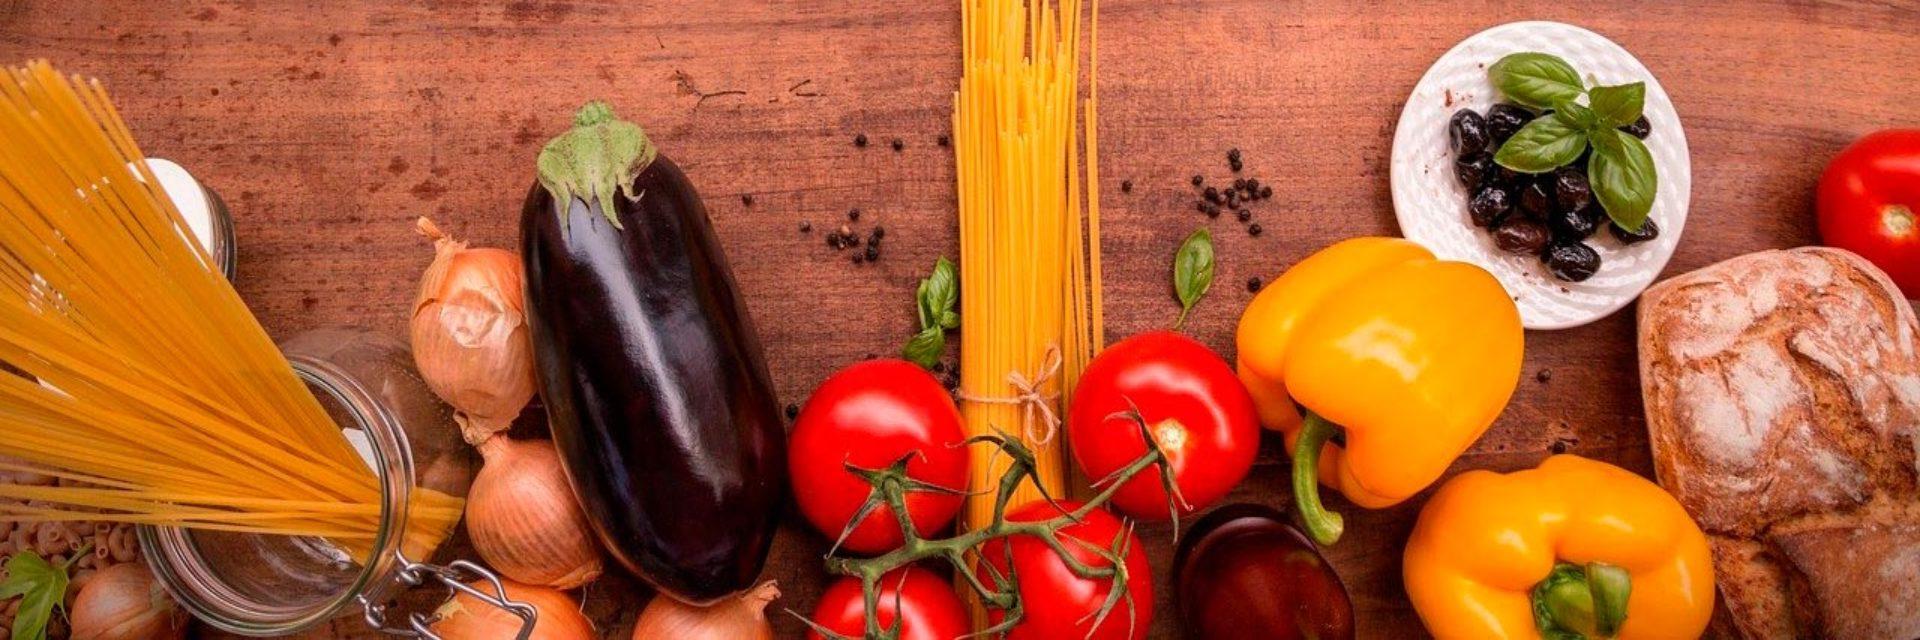 Receita de Maionese de legumes